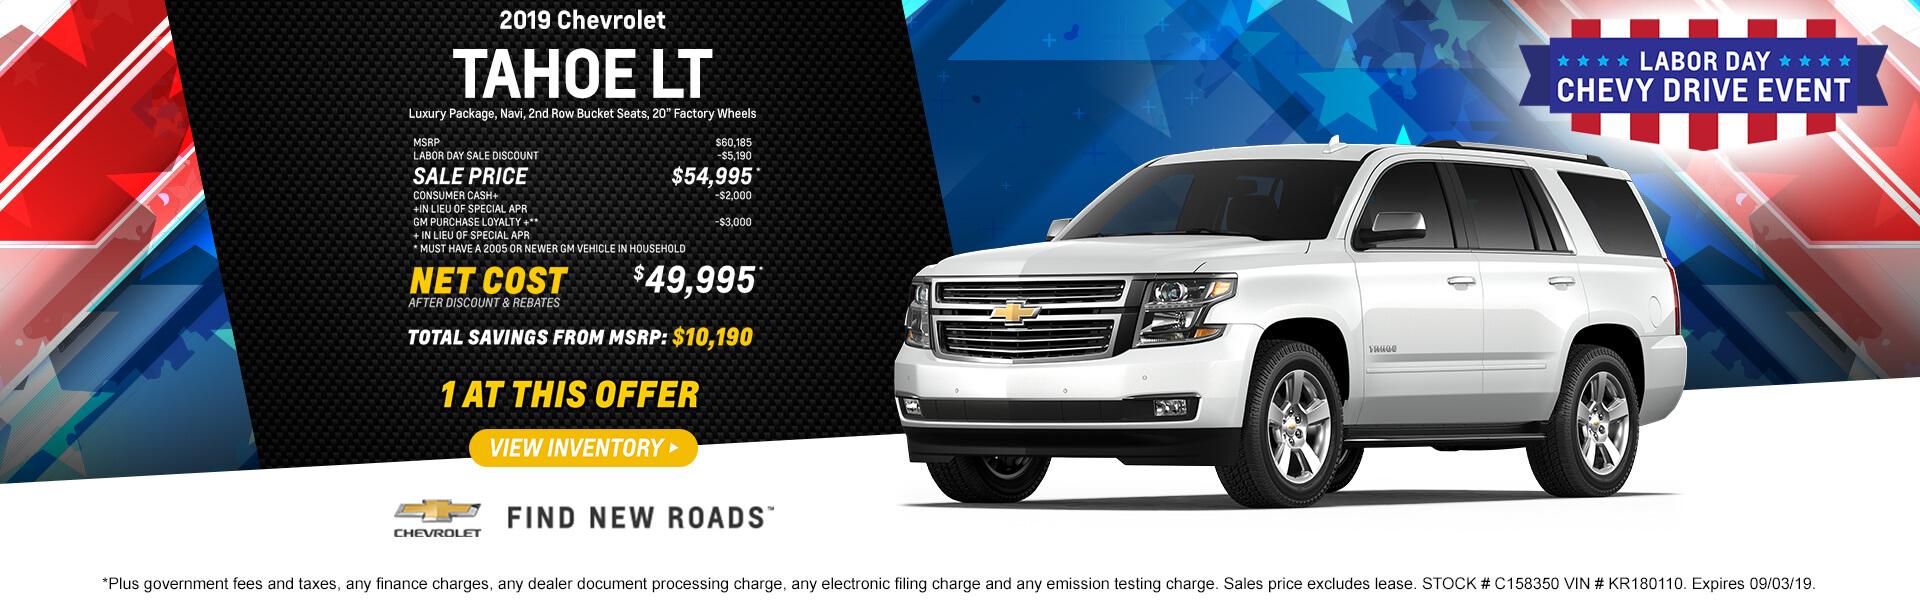 1 New Chevrolet Spark in stock near San Gabriel Valley